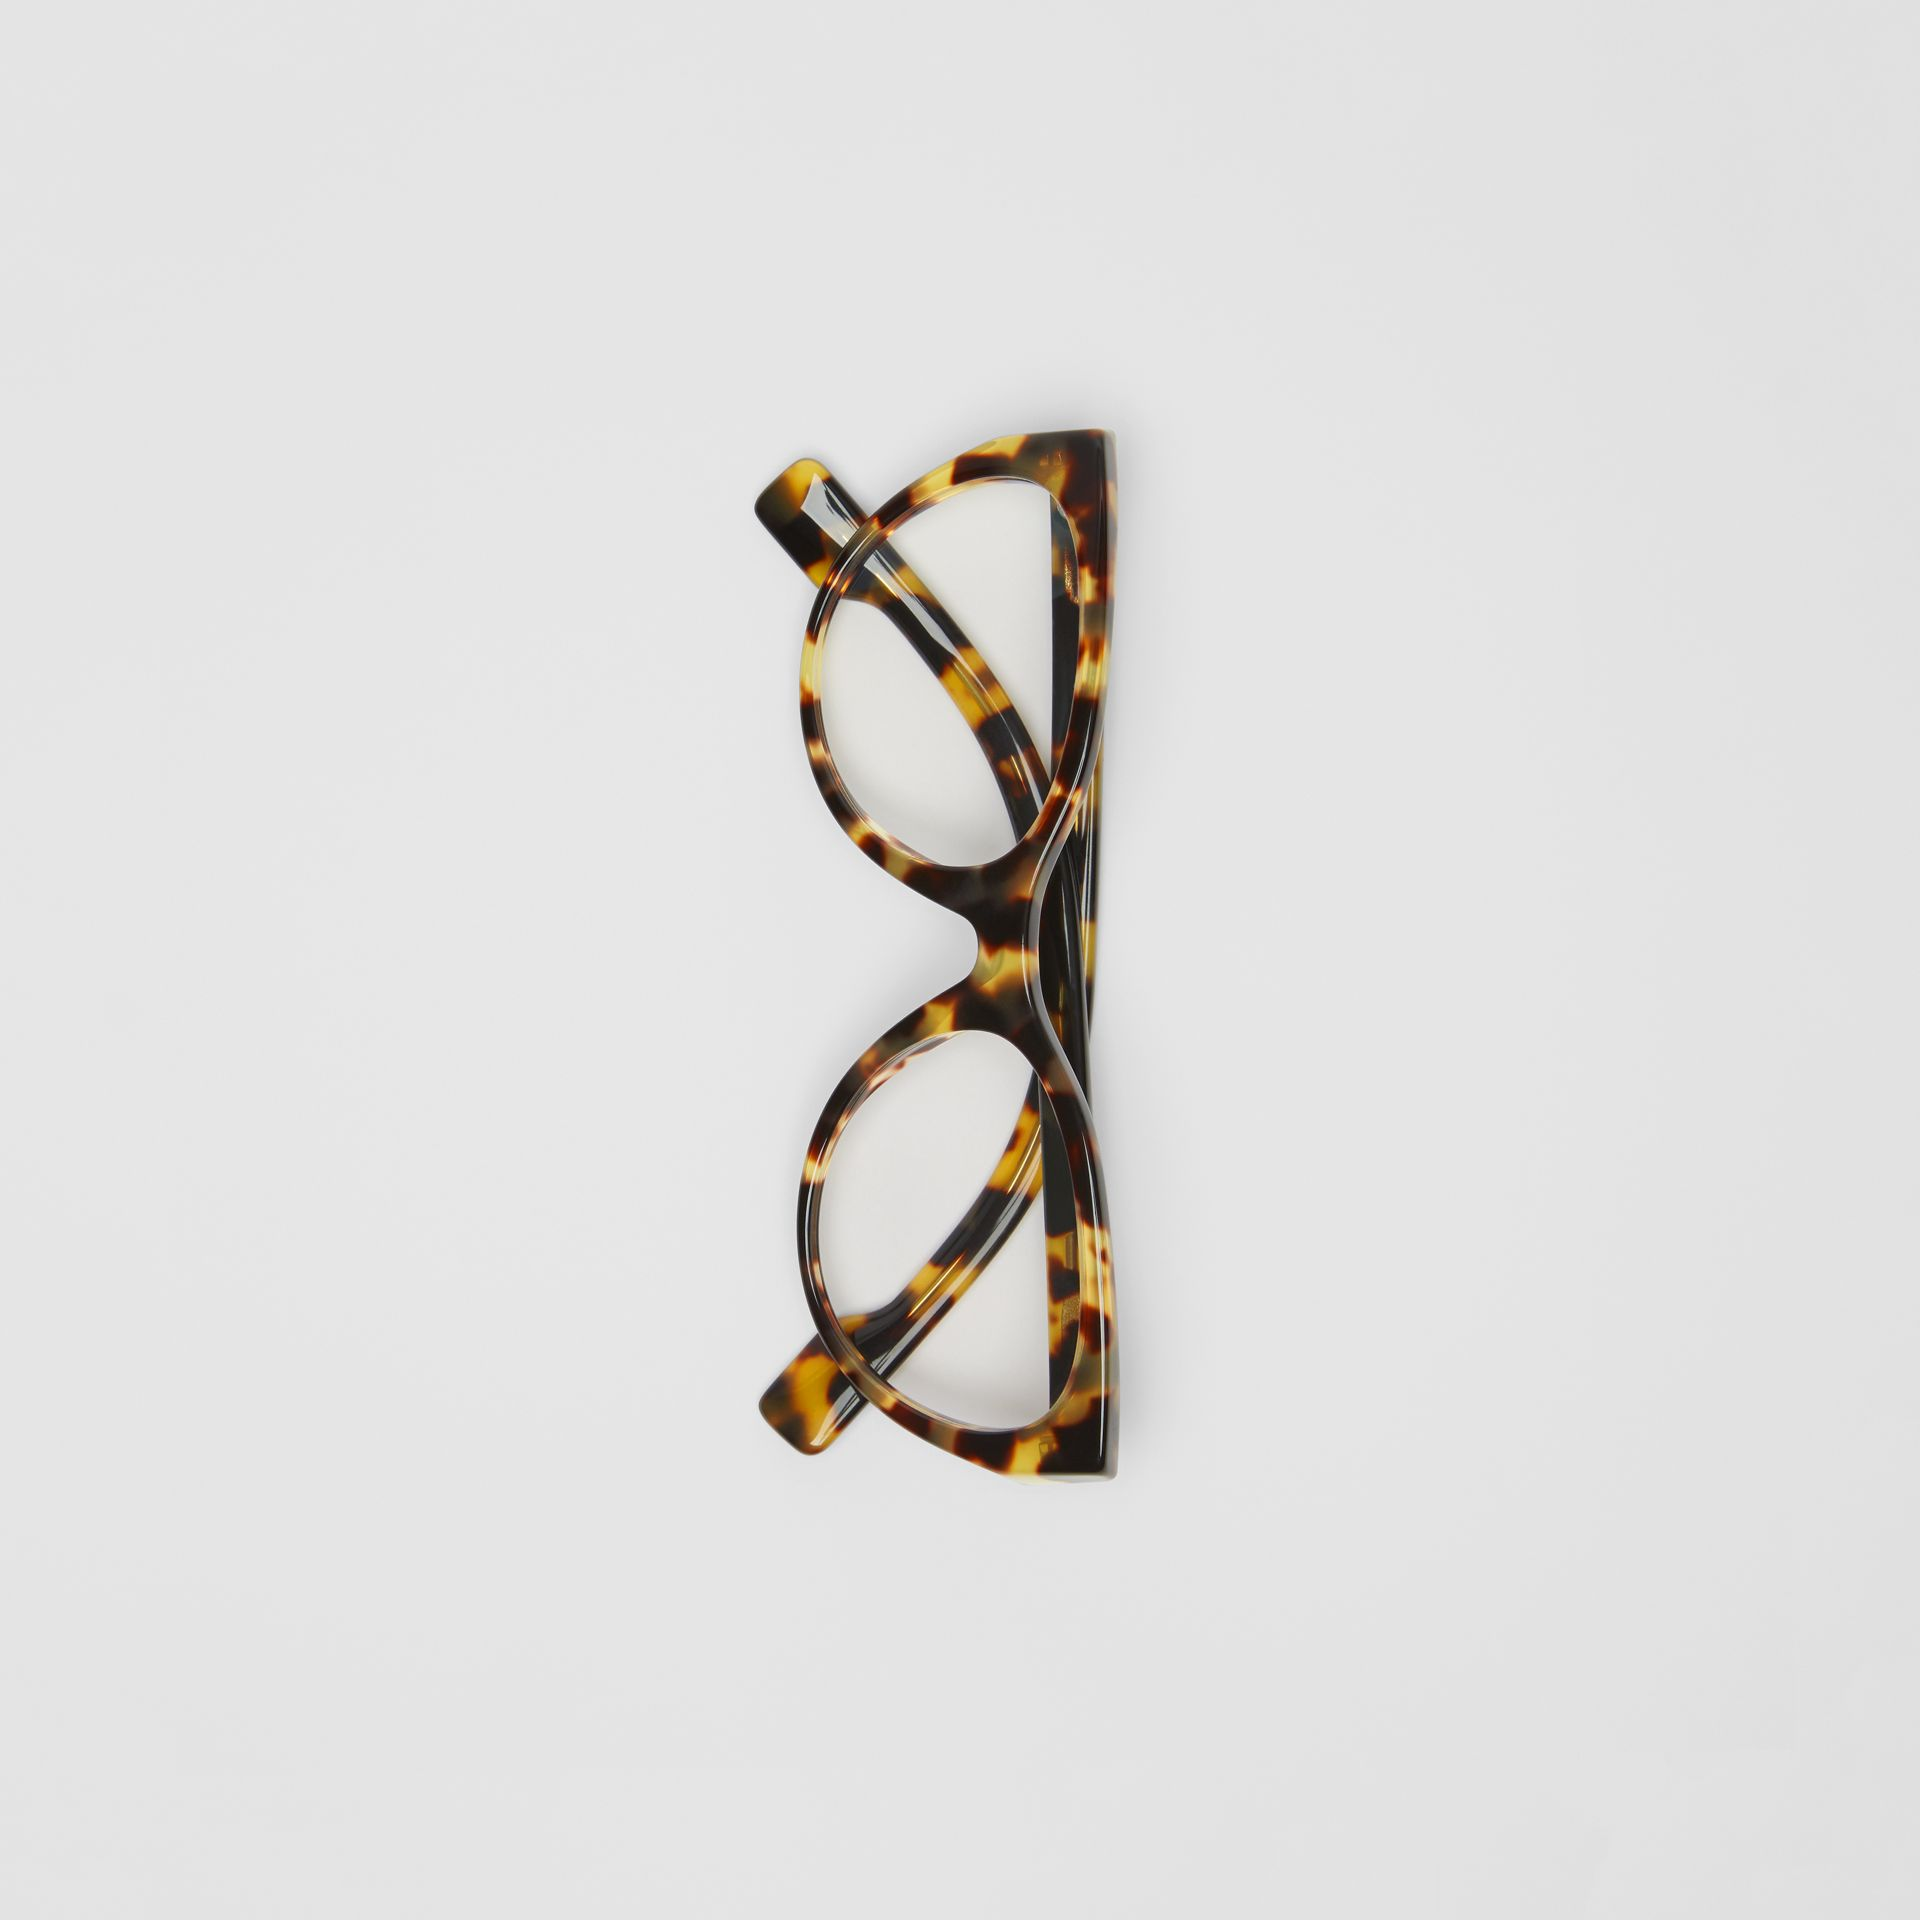 Cat-eye Optical Frames in Tortoise Shell - Women | Burberry - gallery image 3